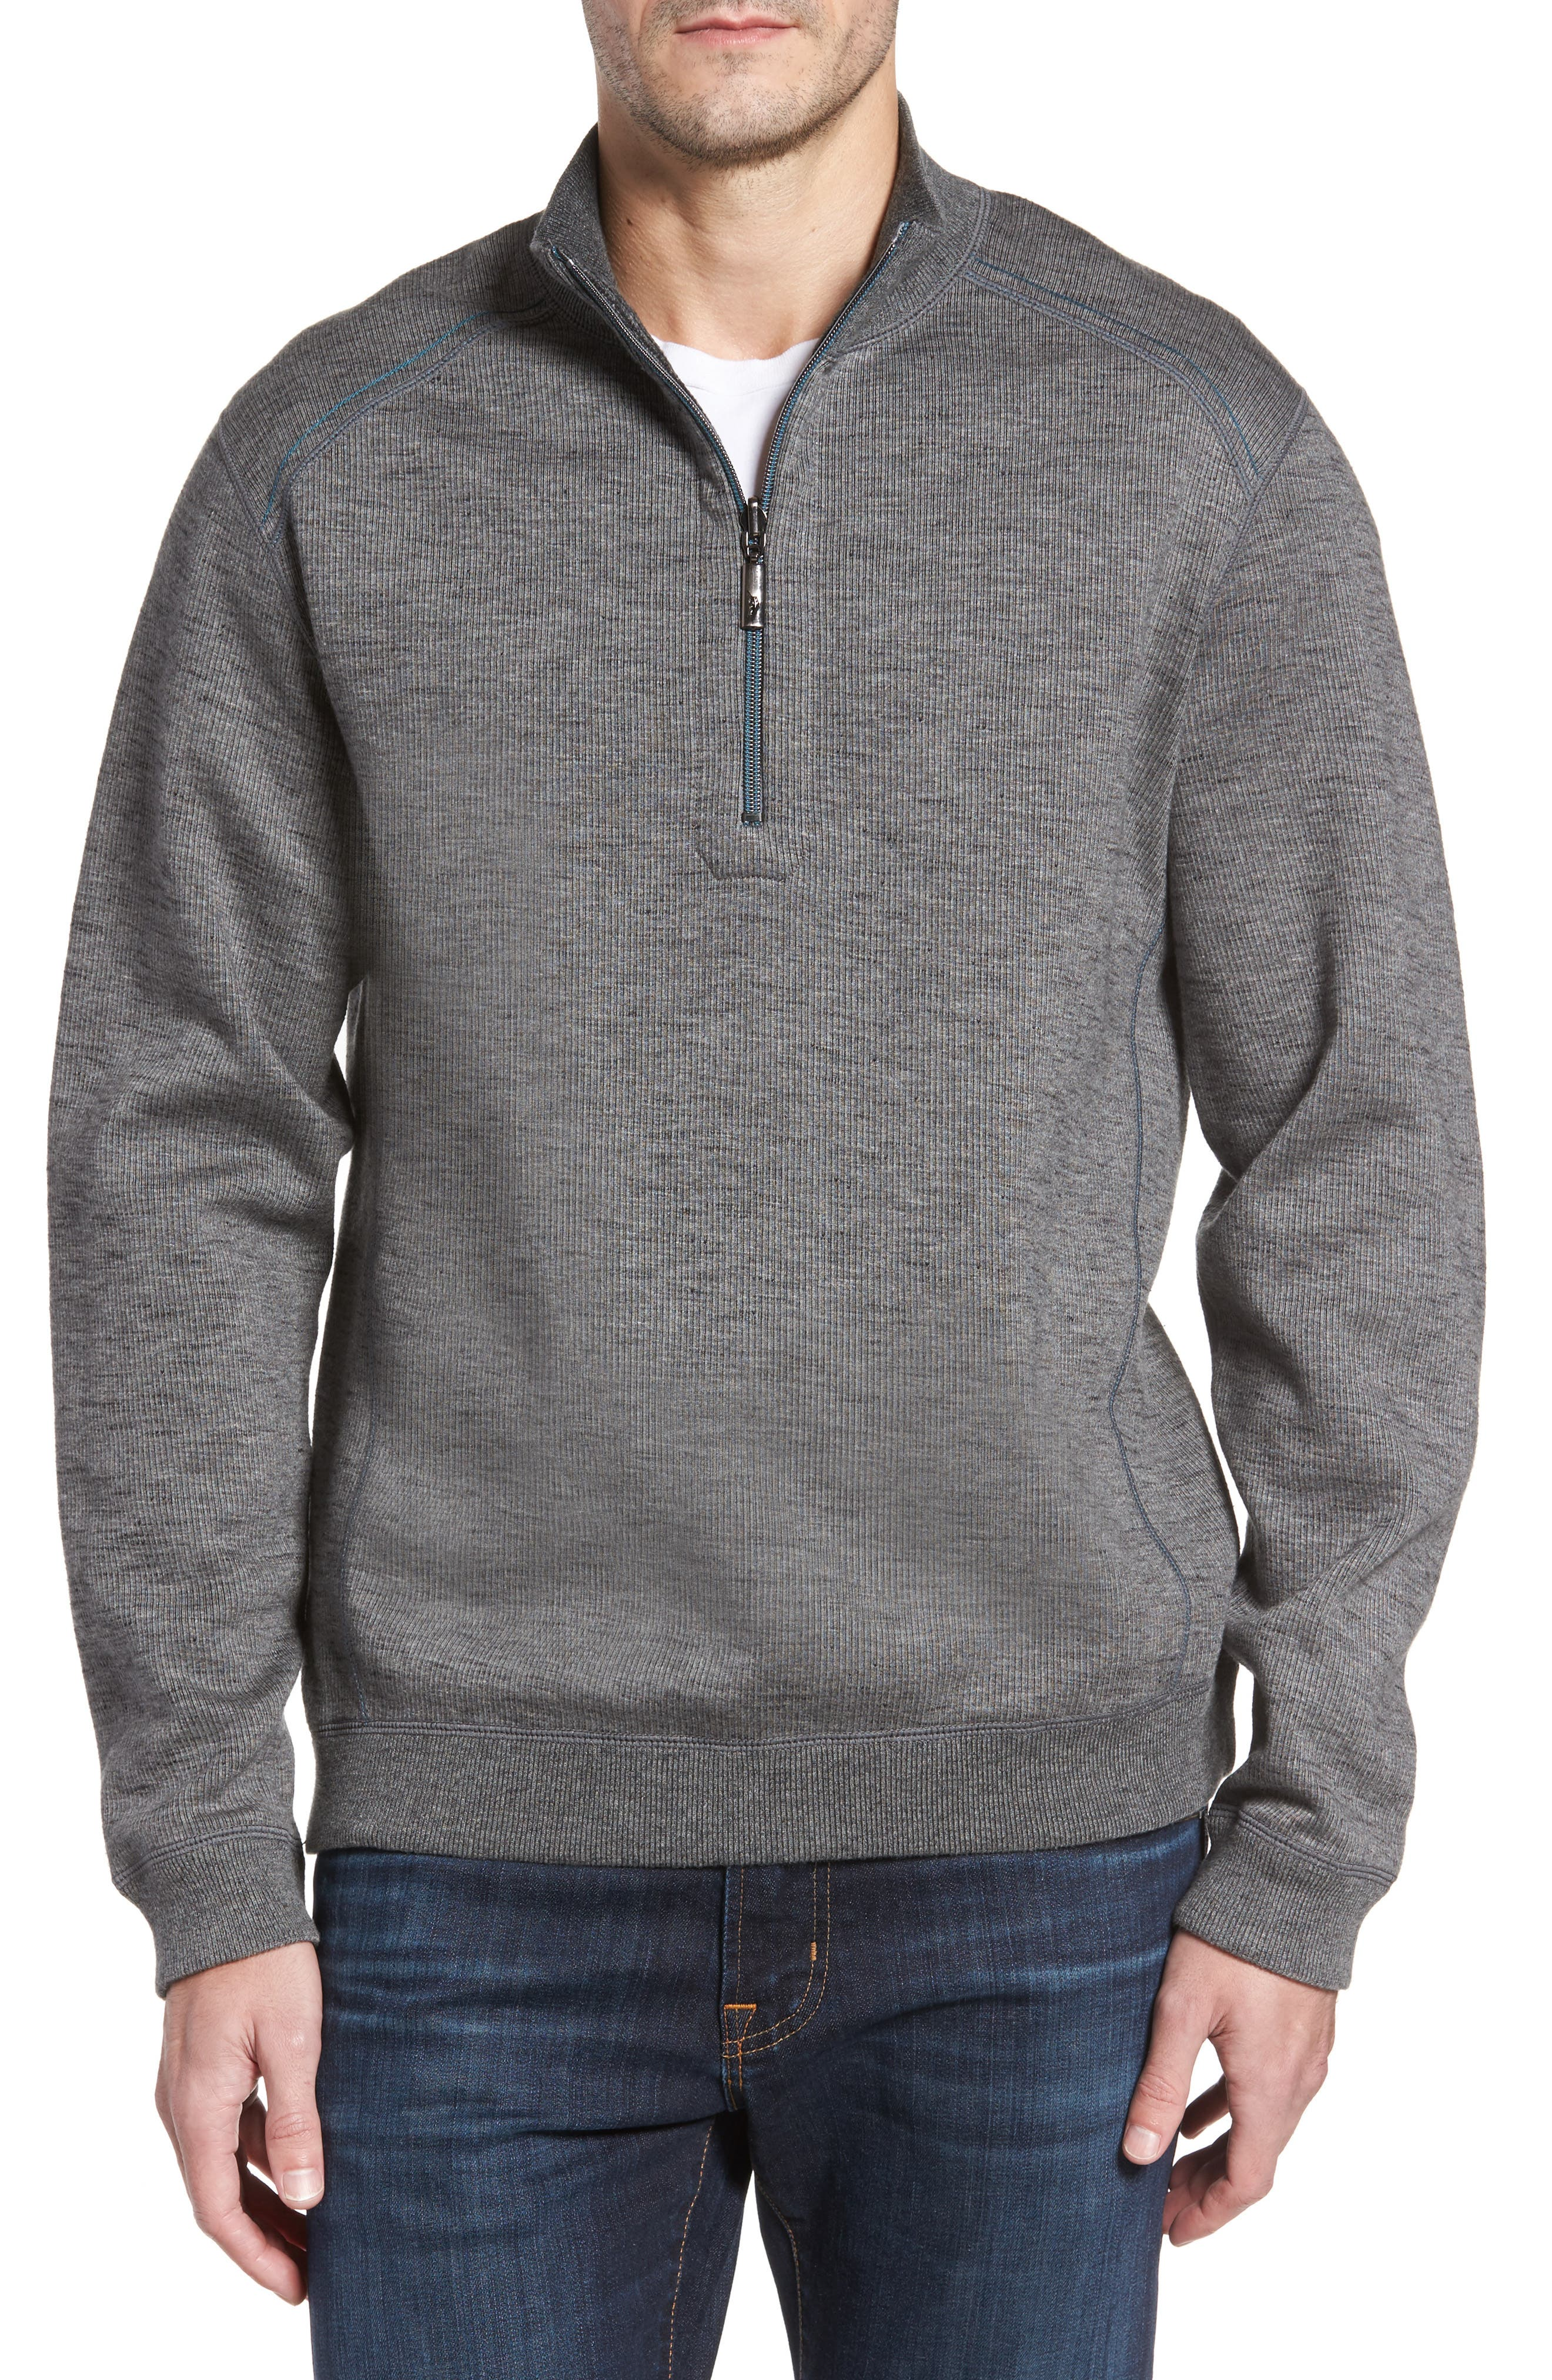 Main Image - Tommy Bahama Flipsider Half Zip Reversible Sweatshirt